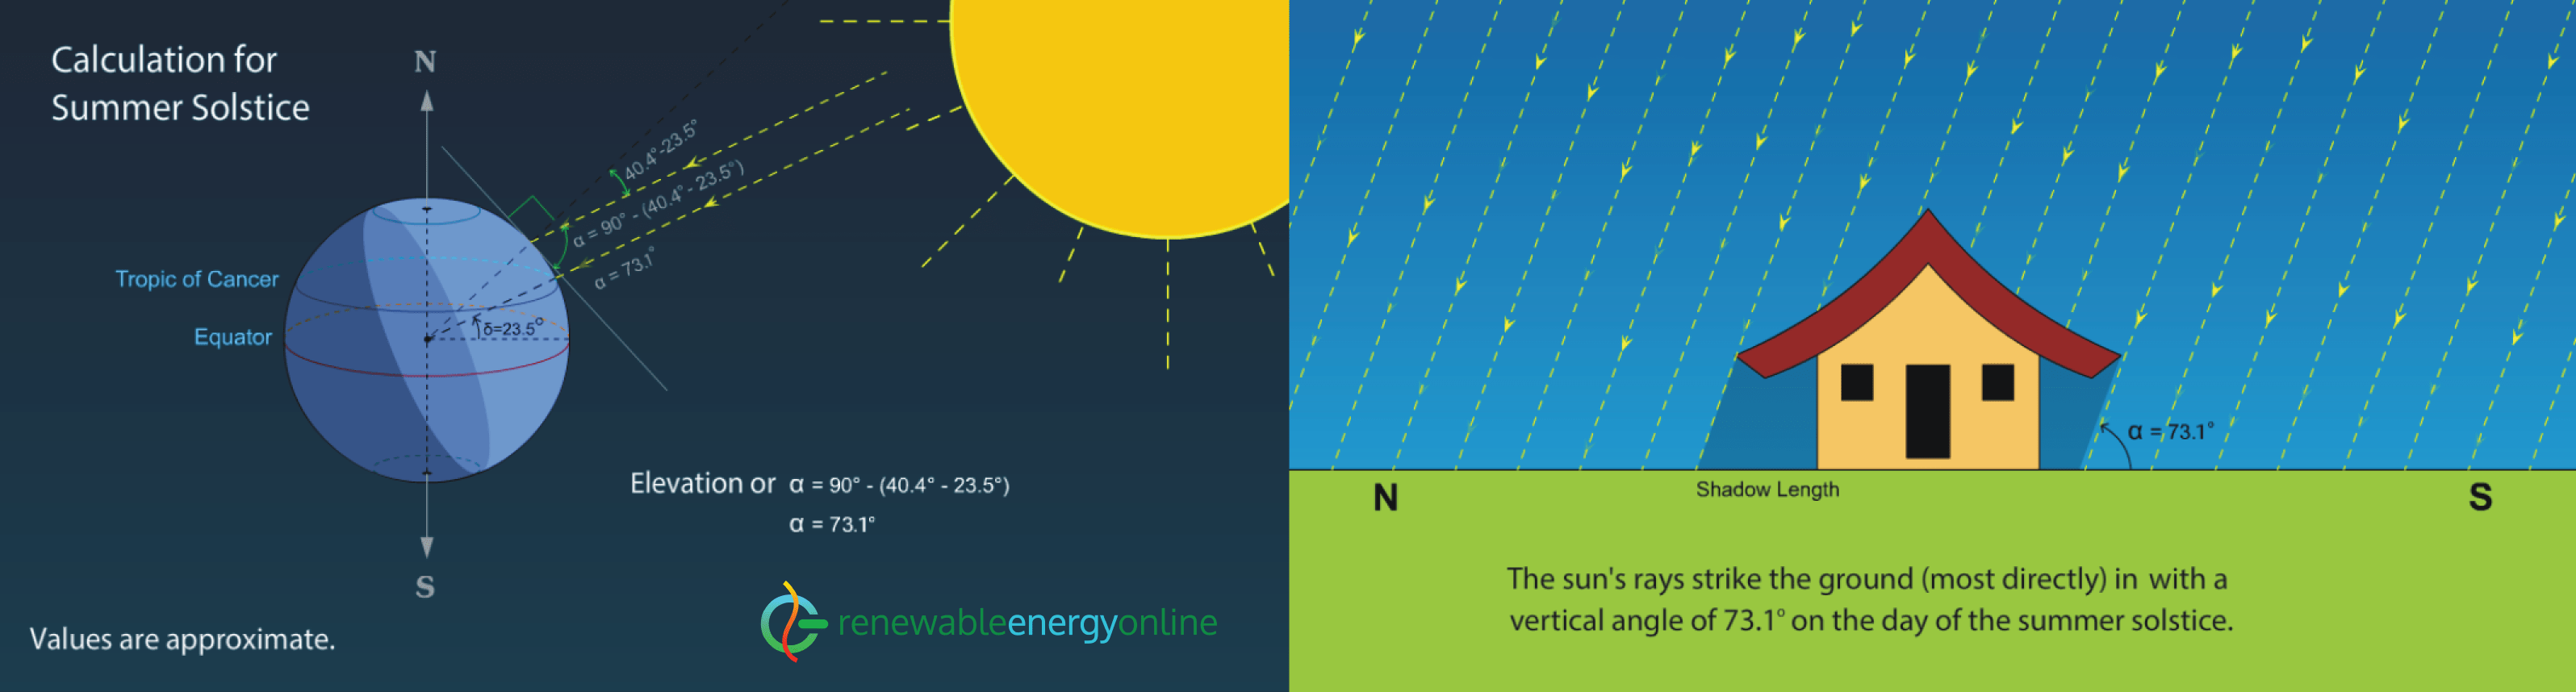 Summer solstice calculation